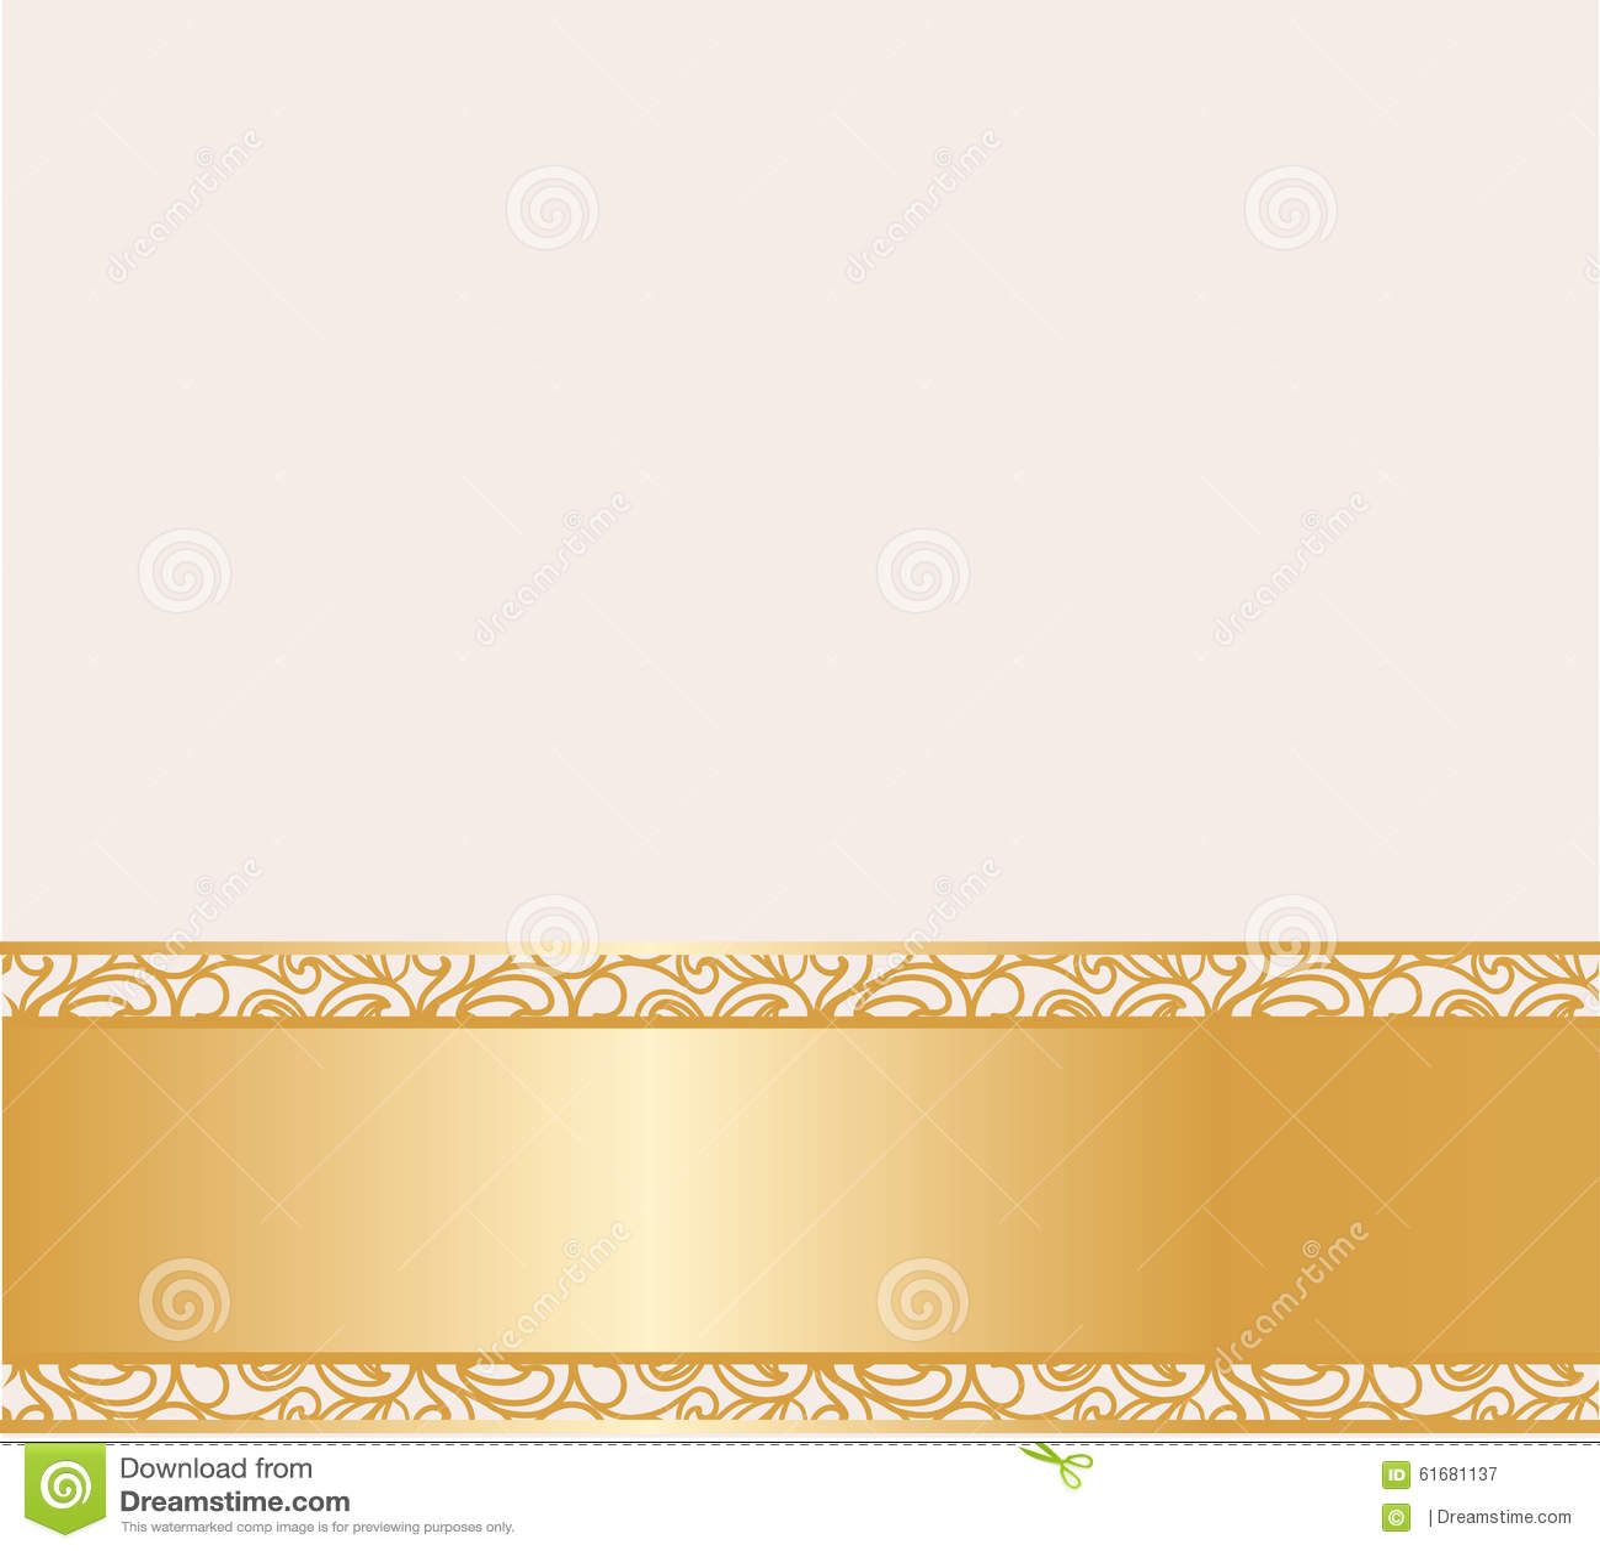 Vintage Cream Lace Card Golden Stock Illustration